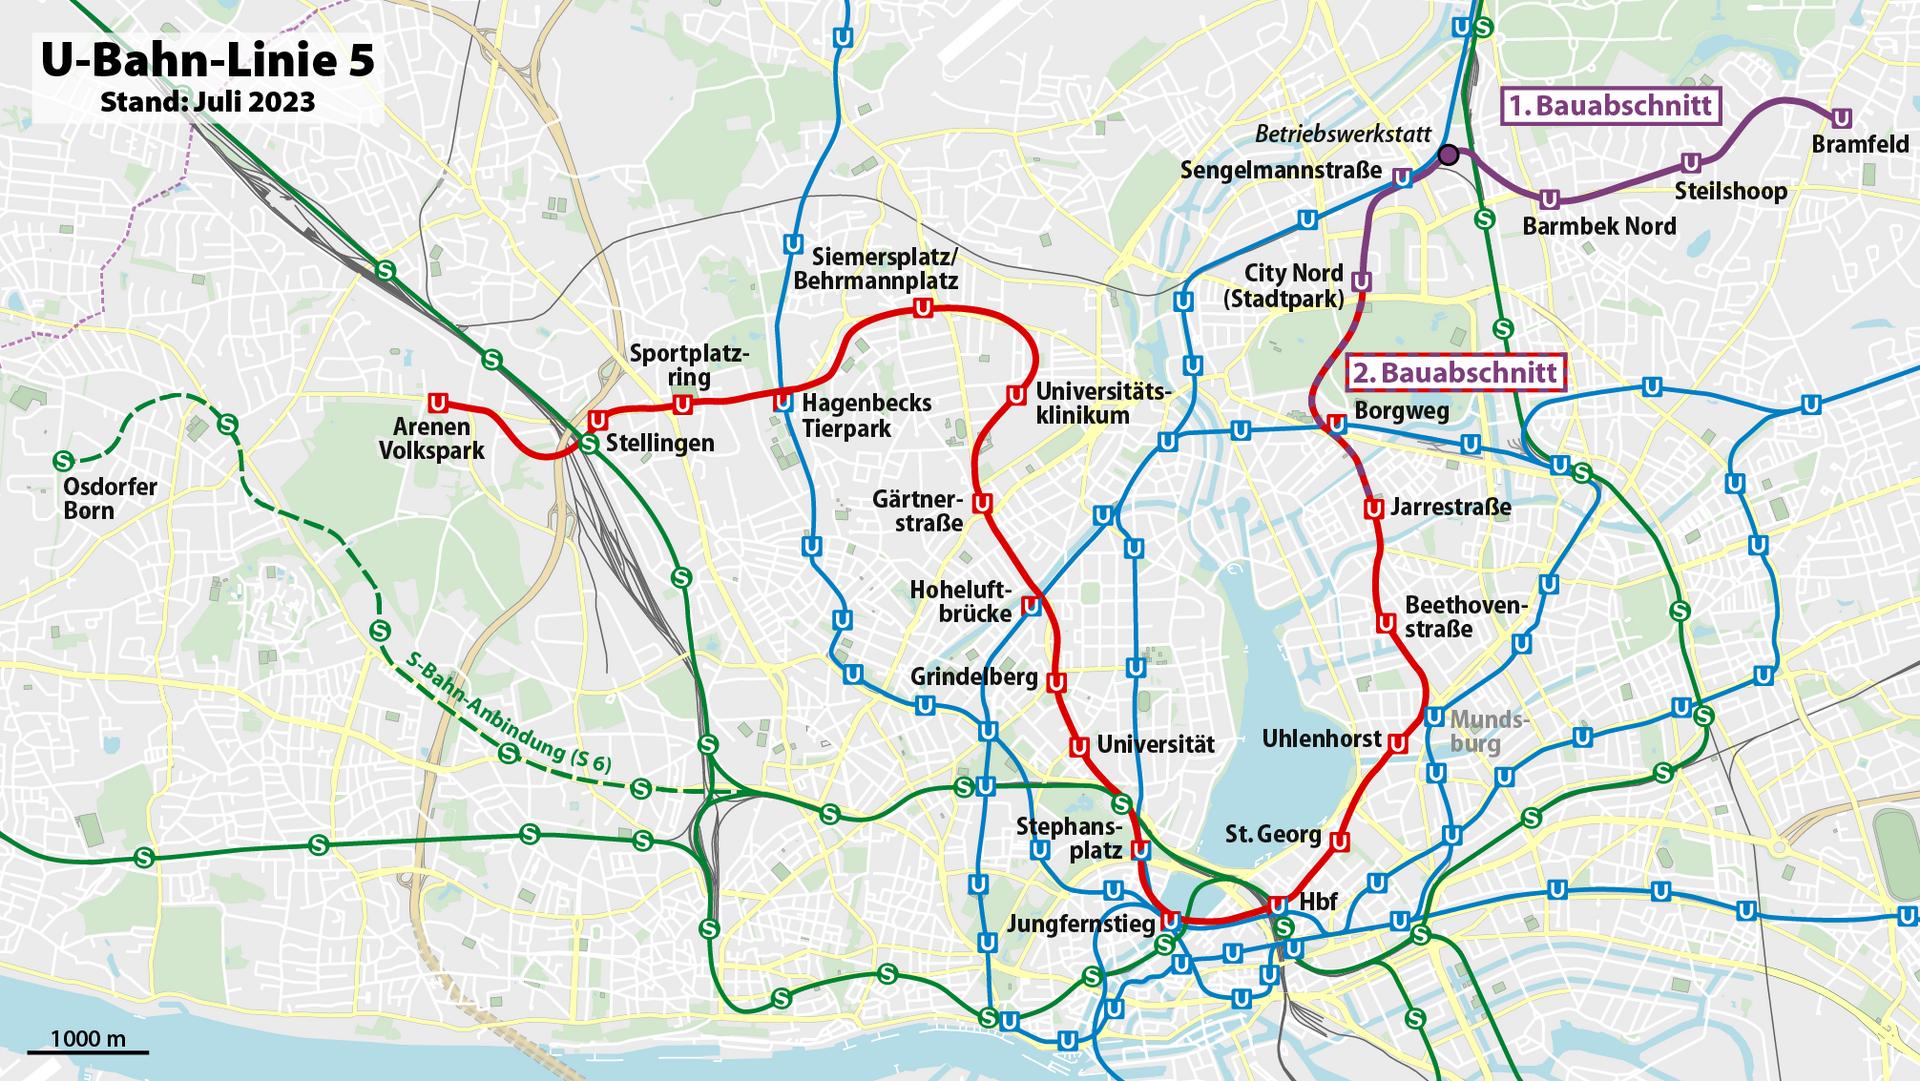 U-Bahn-Linie 5 (Hamburg) – Wikipedia